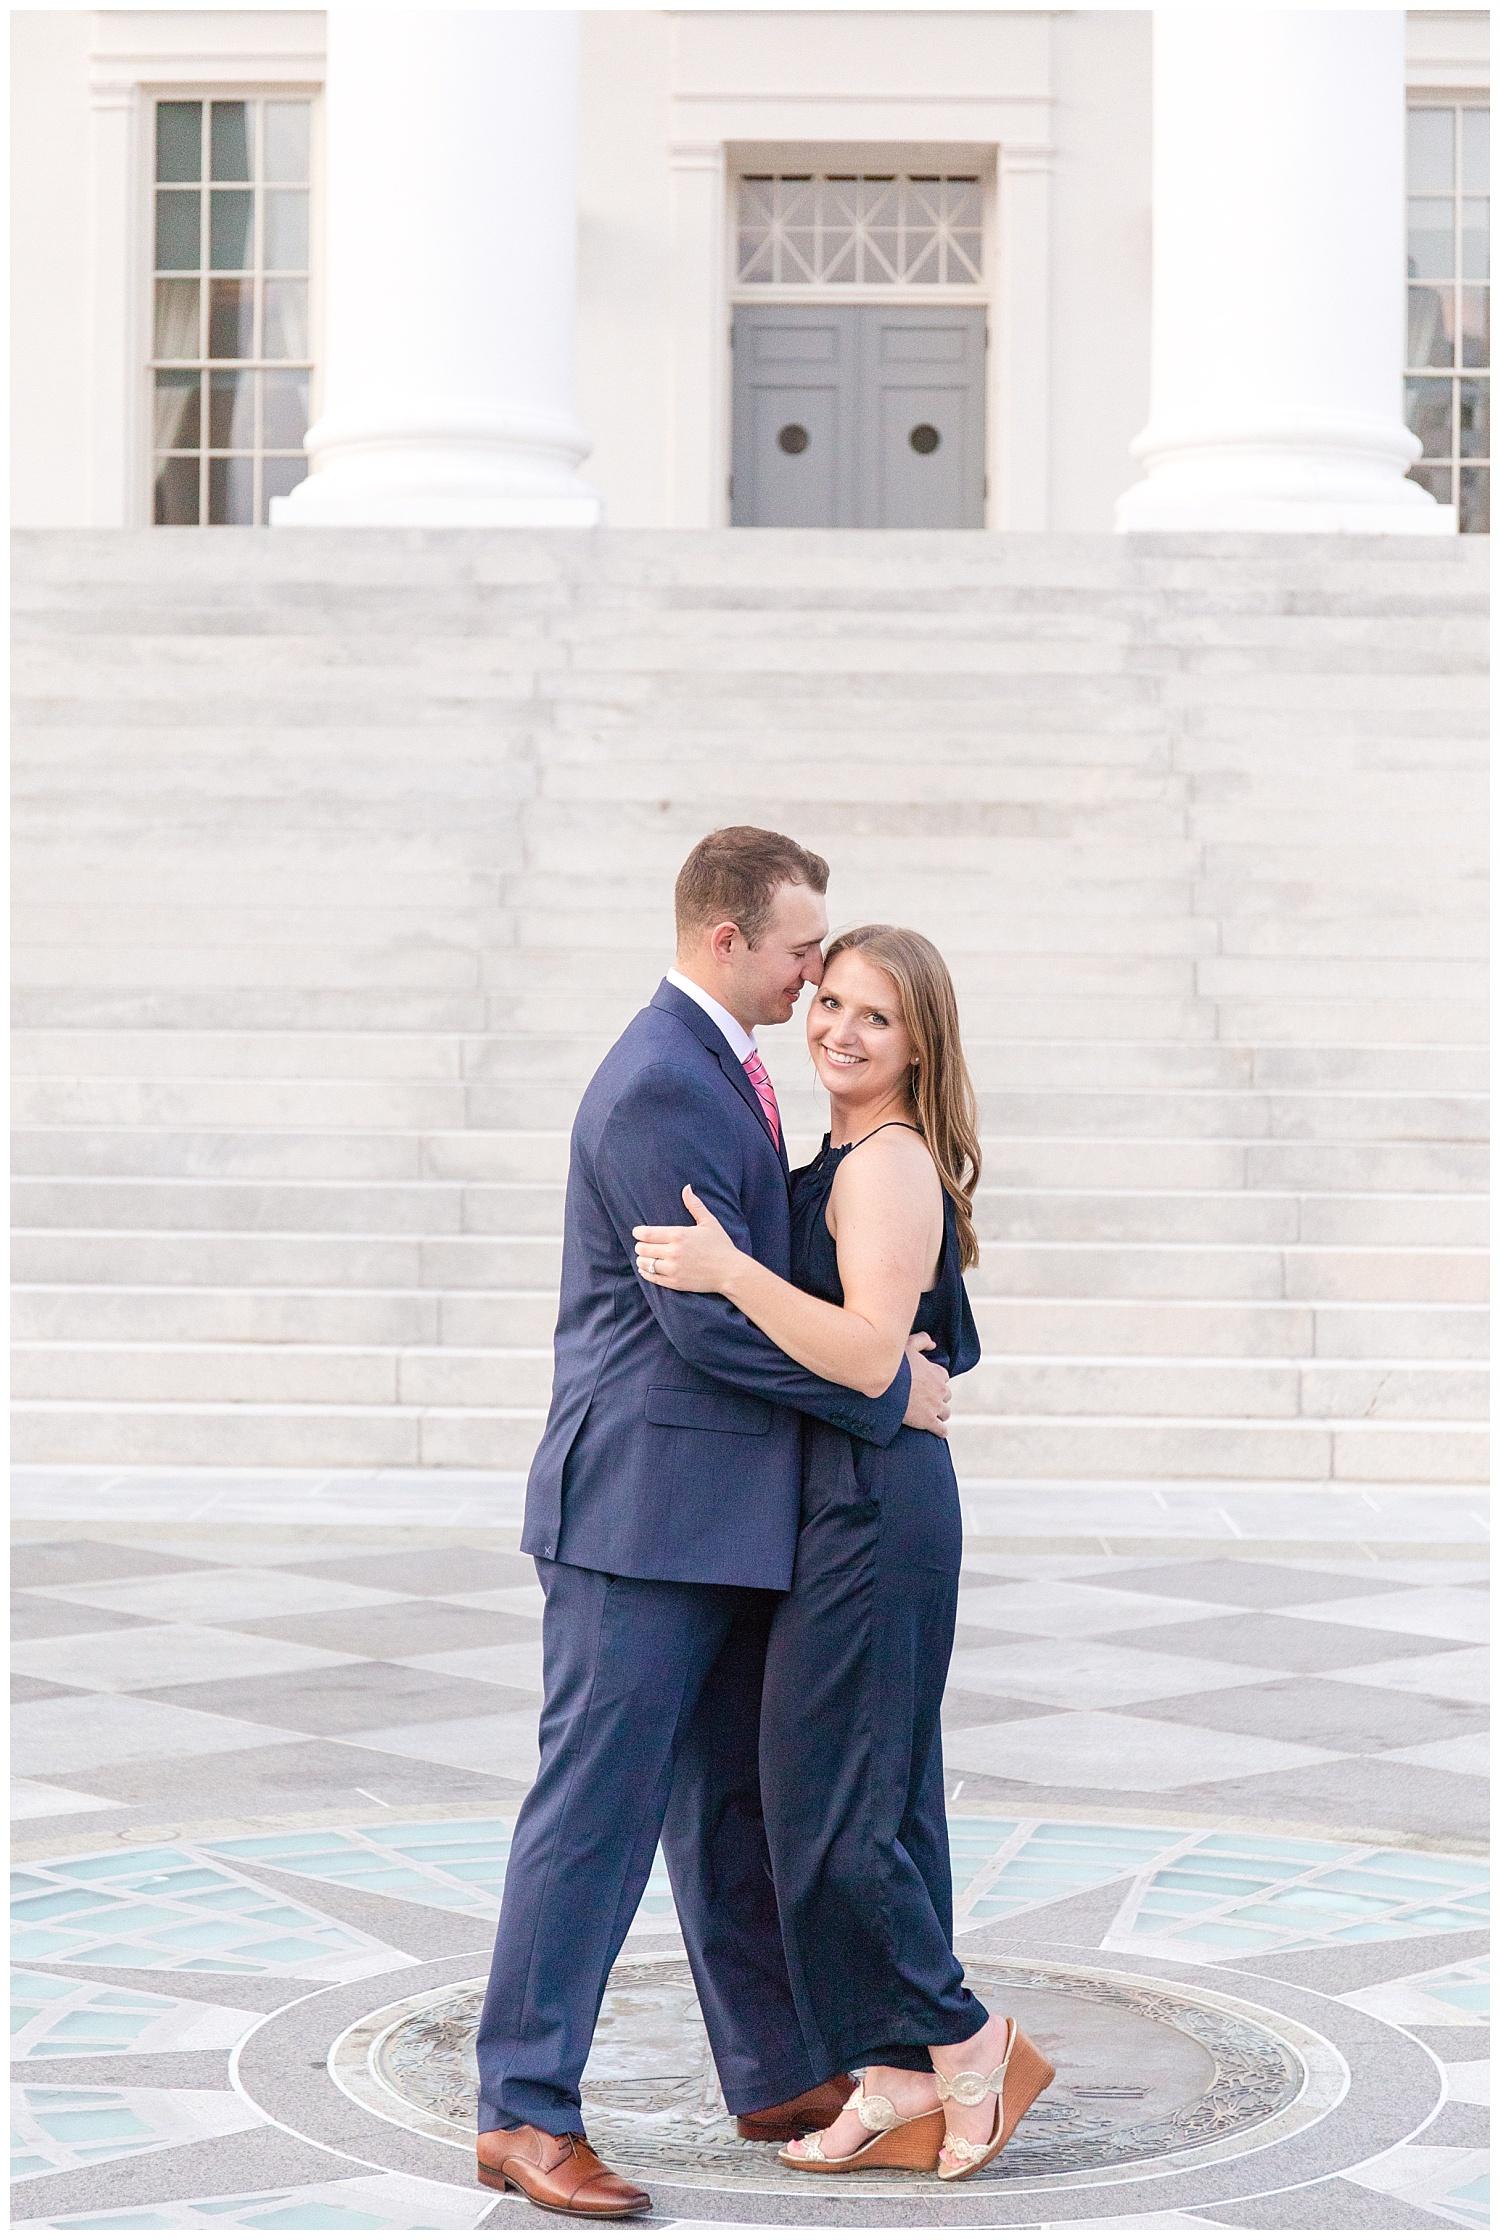 MJMP Richmond Wedding Photographer Summer Virginia State Capitol Engagement Session_0020.jpg